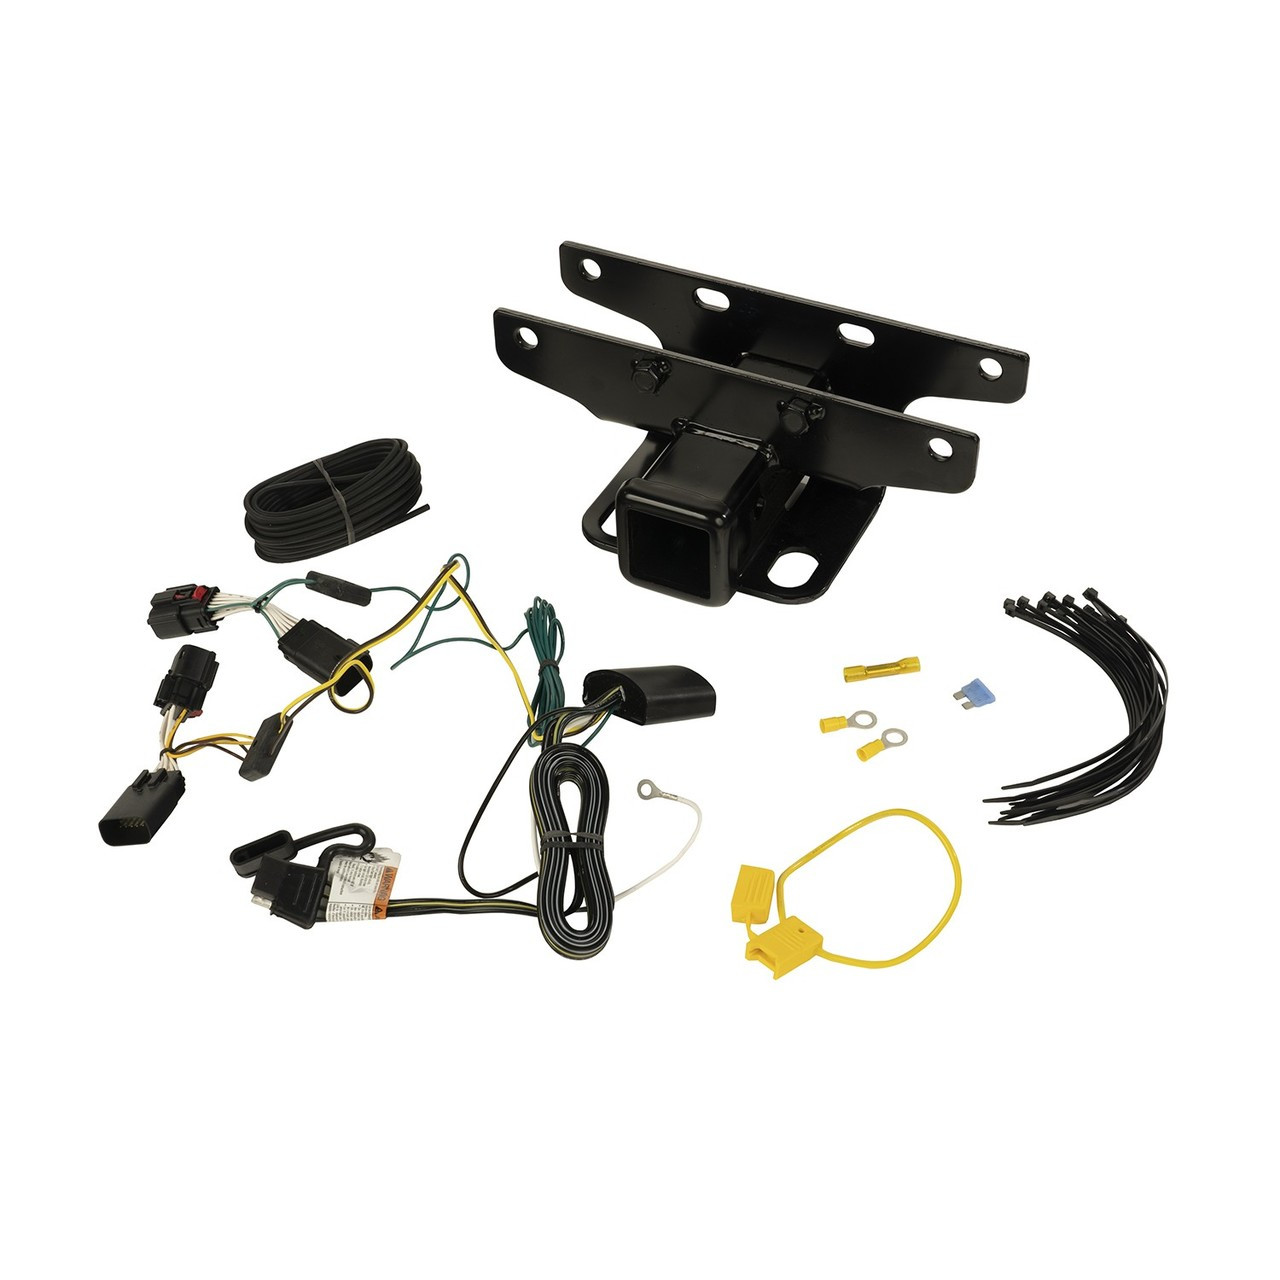 jeep wrangler jl receiver hitch kit w wiring harness 18 19 jl  [ 1280 x 1280 Pixel ]